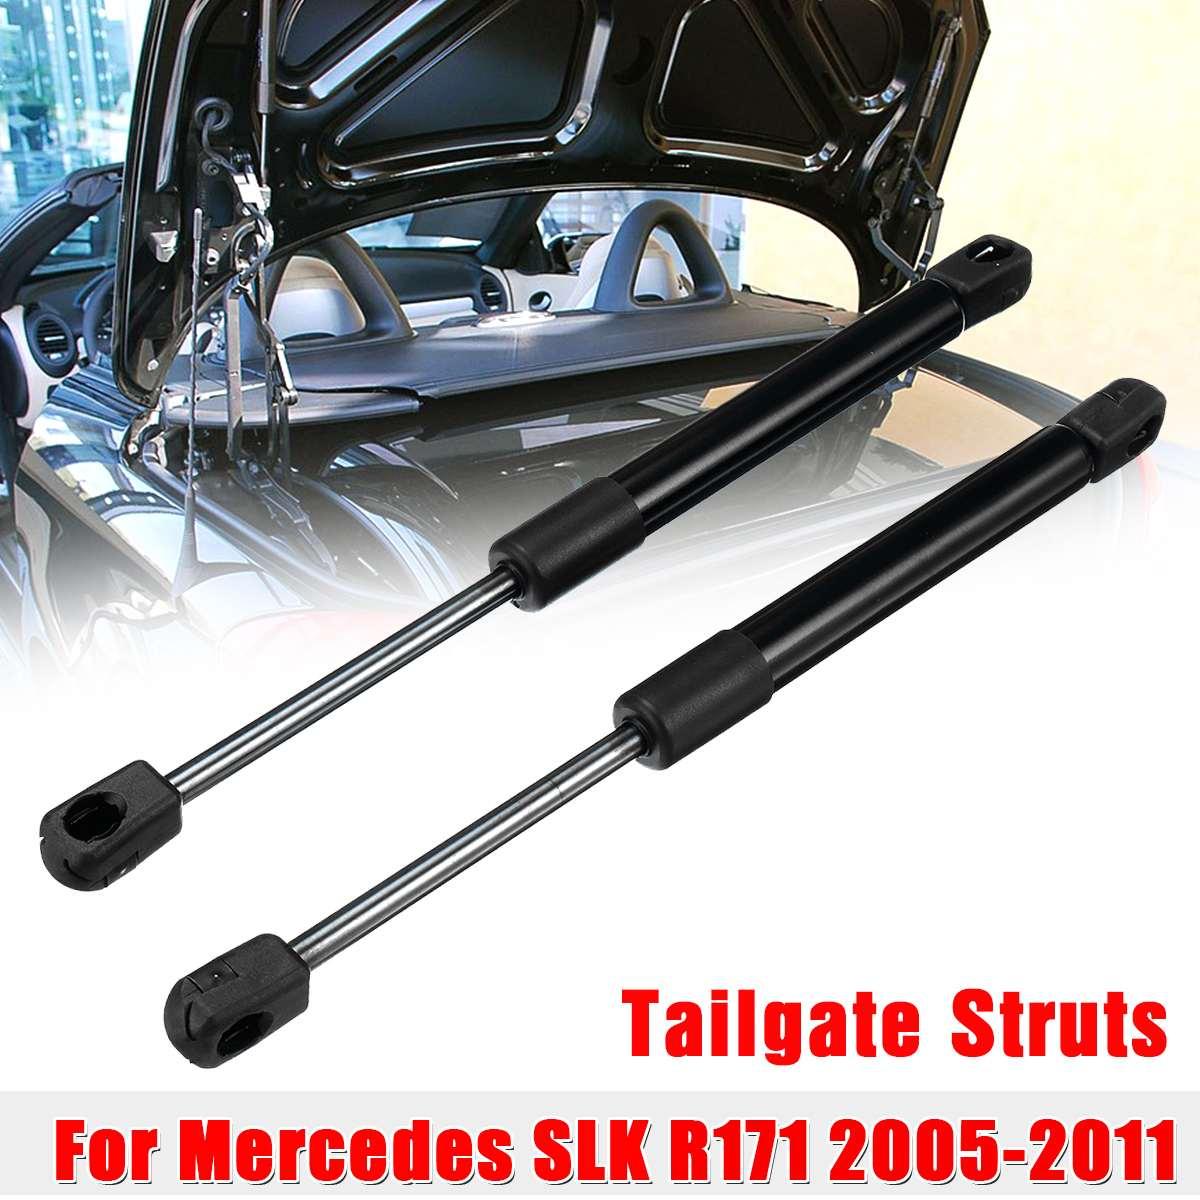 2X ด้านหลัง Tailgate BOOT Gas สปริงแรงกระแทก Strut Struts สนับสนุนบาร์ 1717500036 สำหรับ Mercedes Benz SLK R171 2005-2011